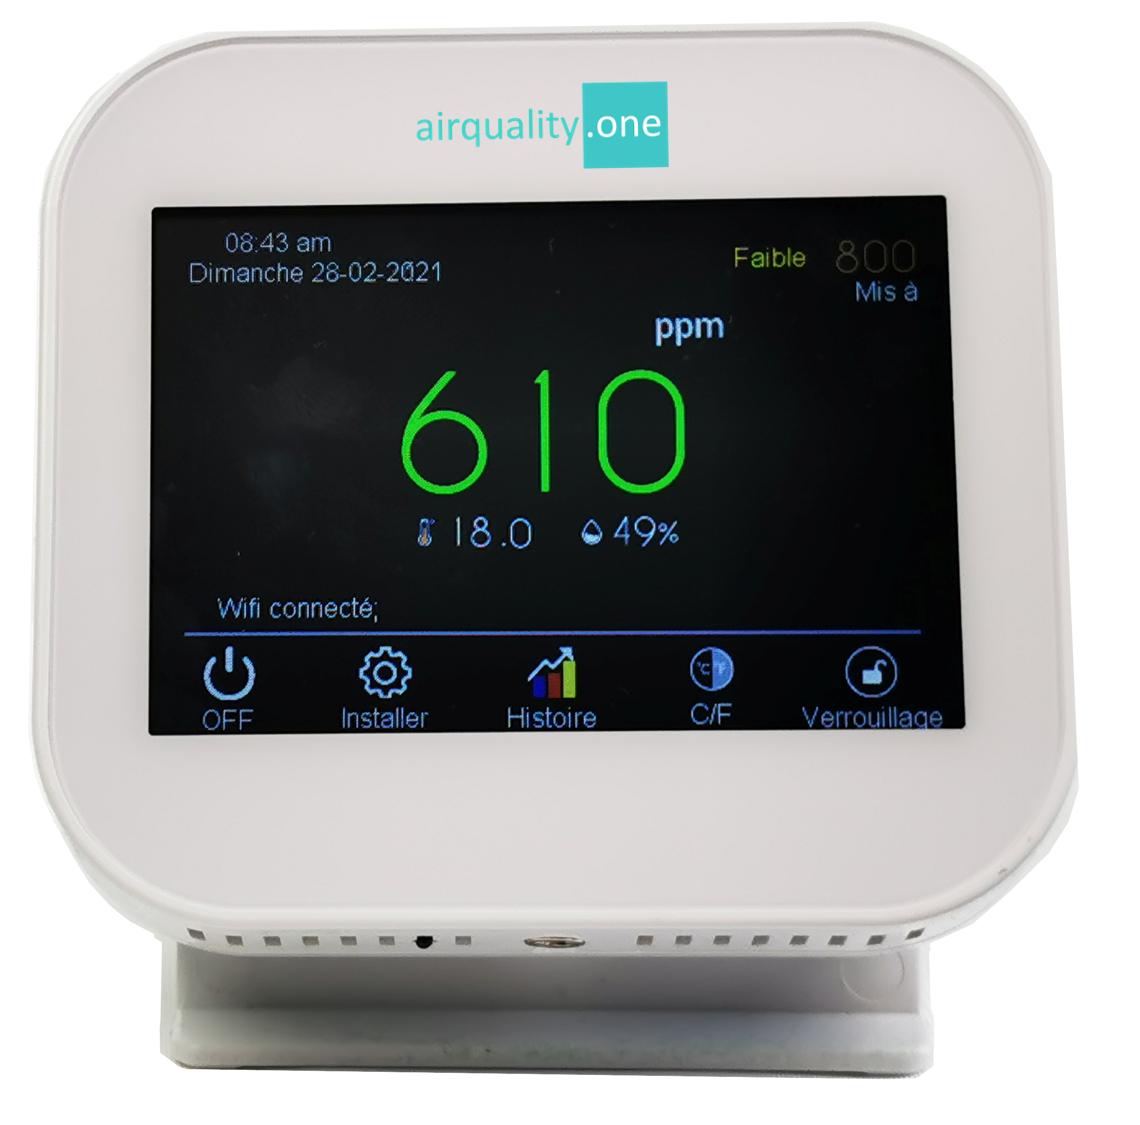 co2-temperature-humidity-wifi-sensor-indoor-air-quality